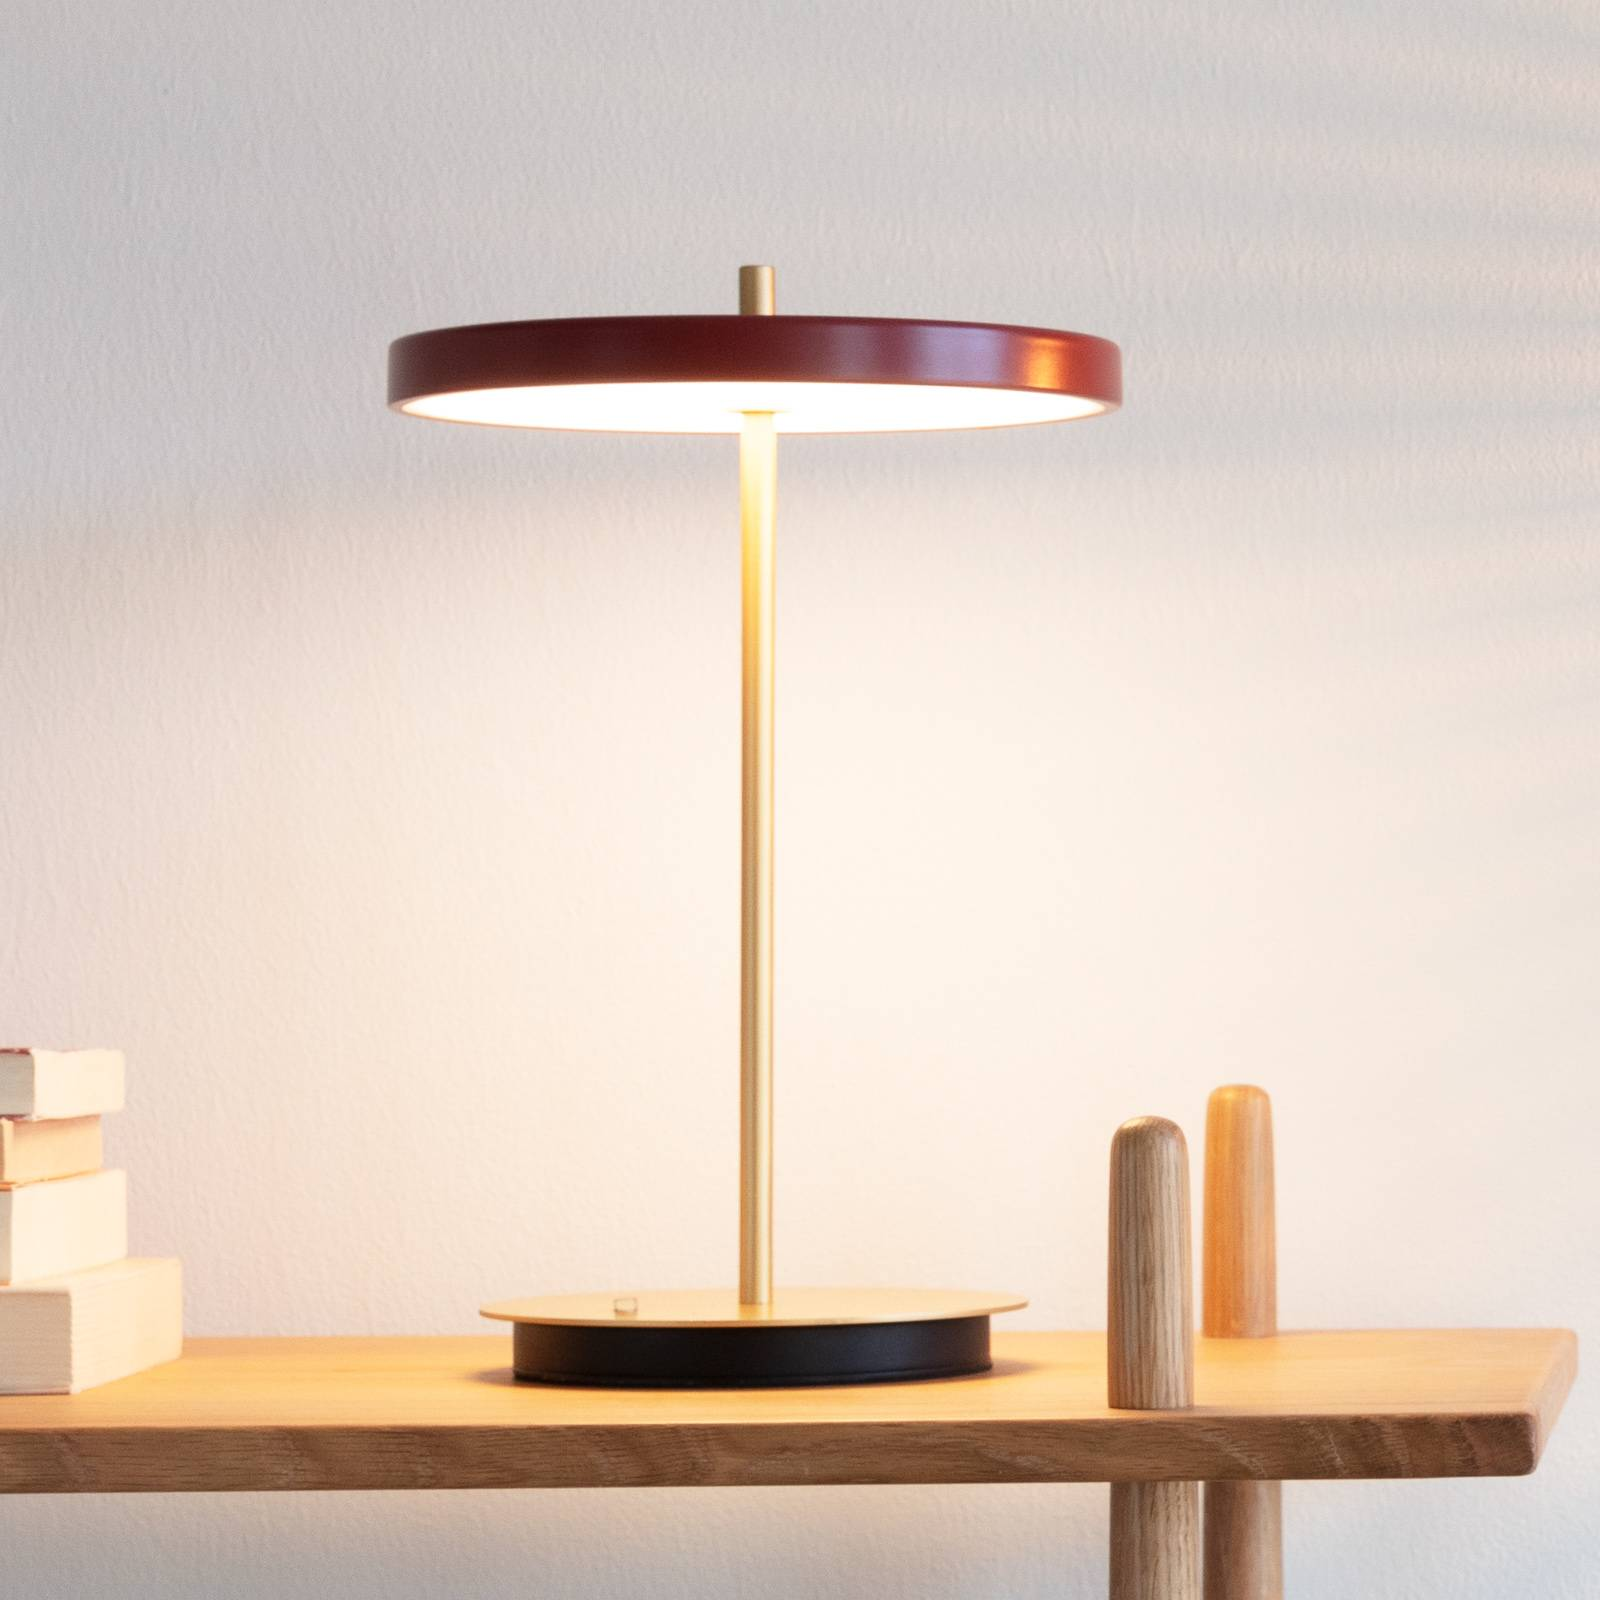 UMAGE -LED-pöytälamppu Asteria move, punainen